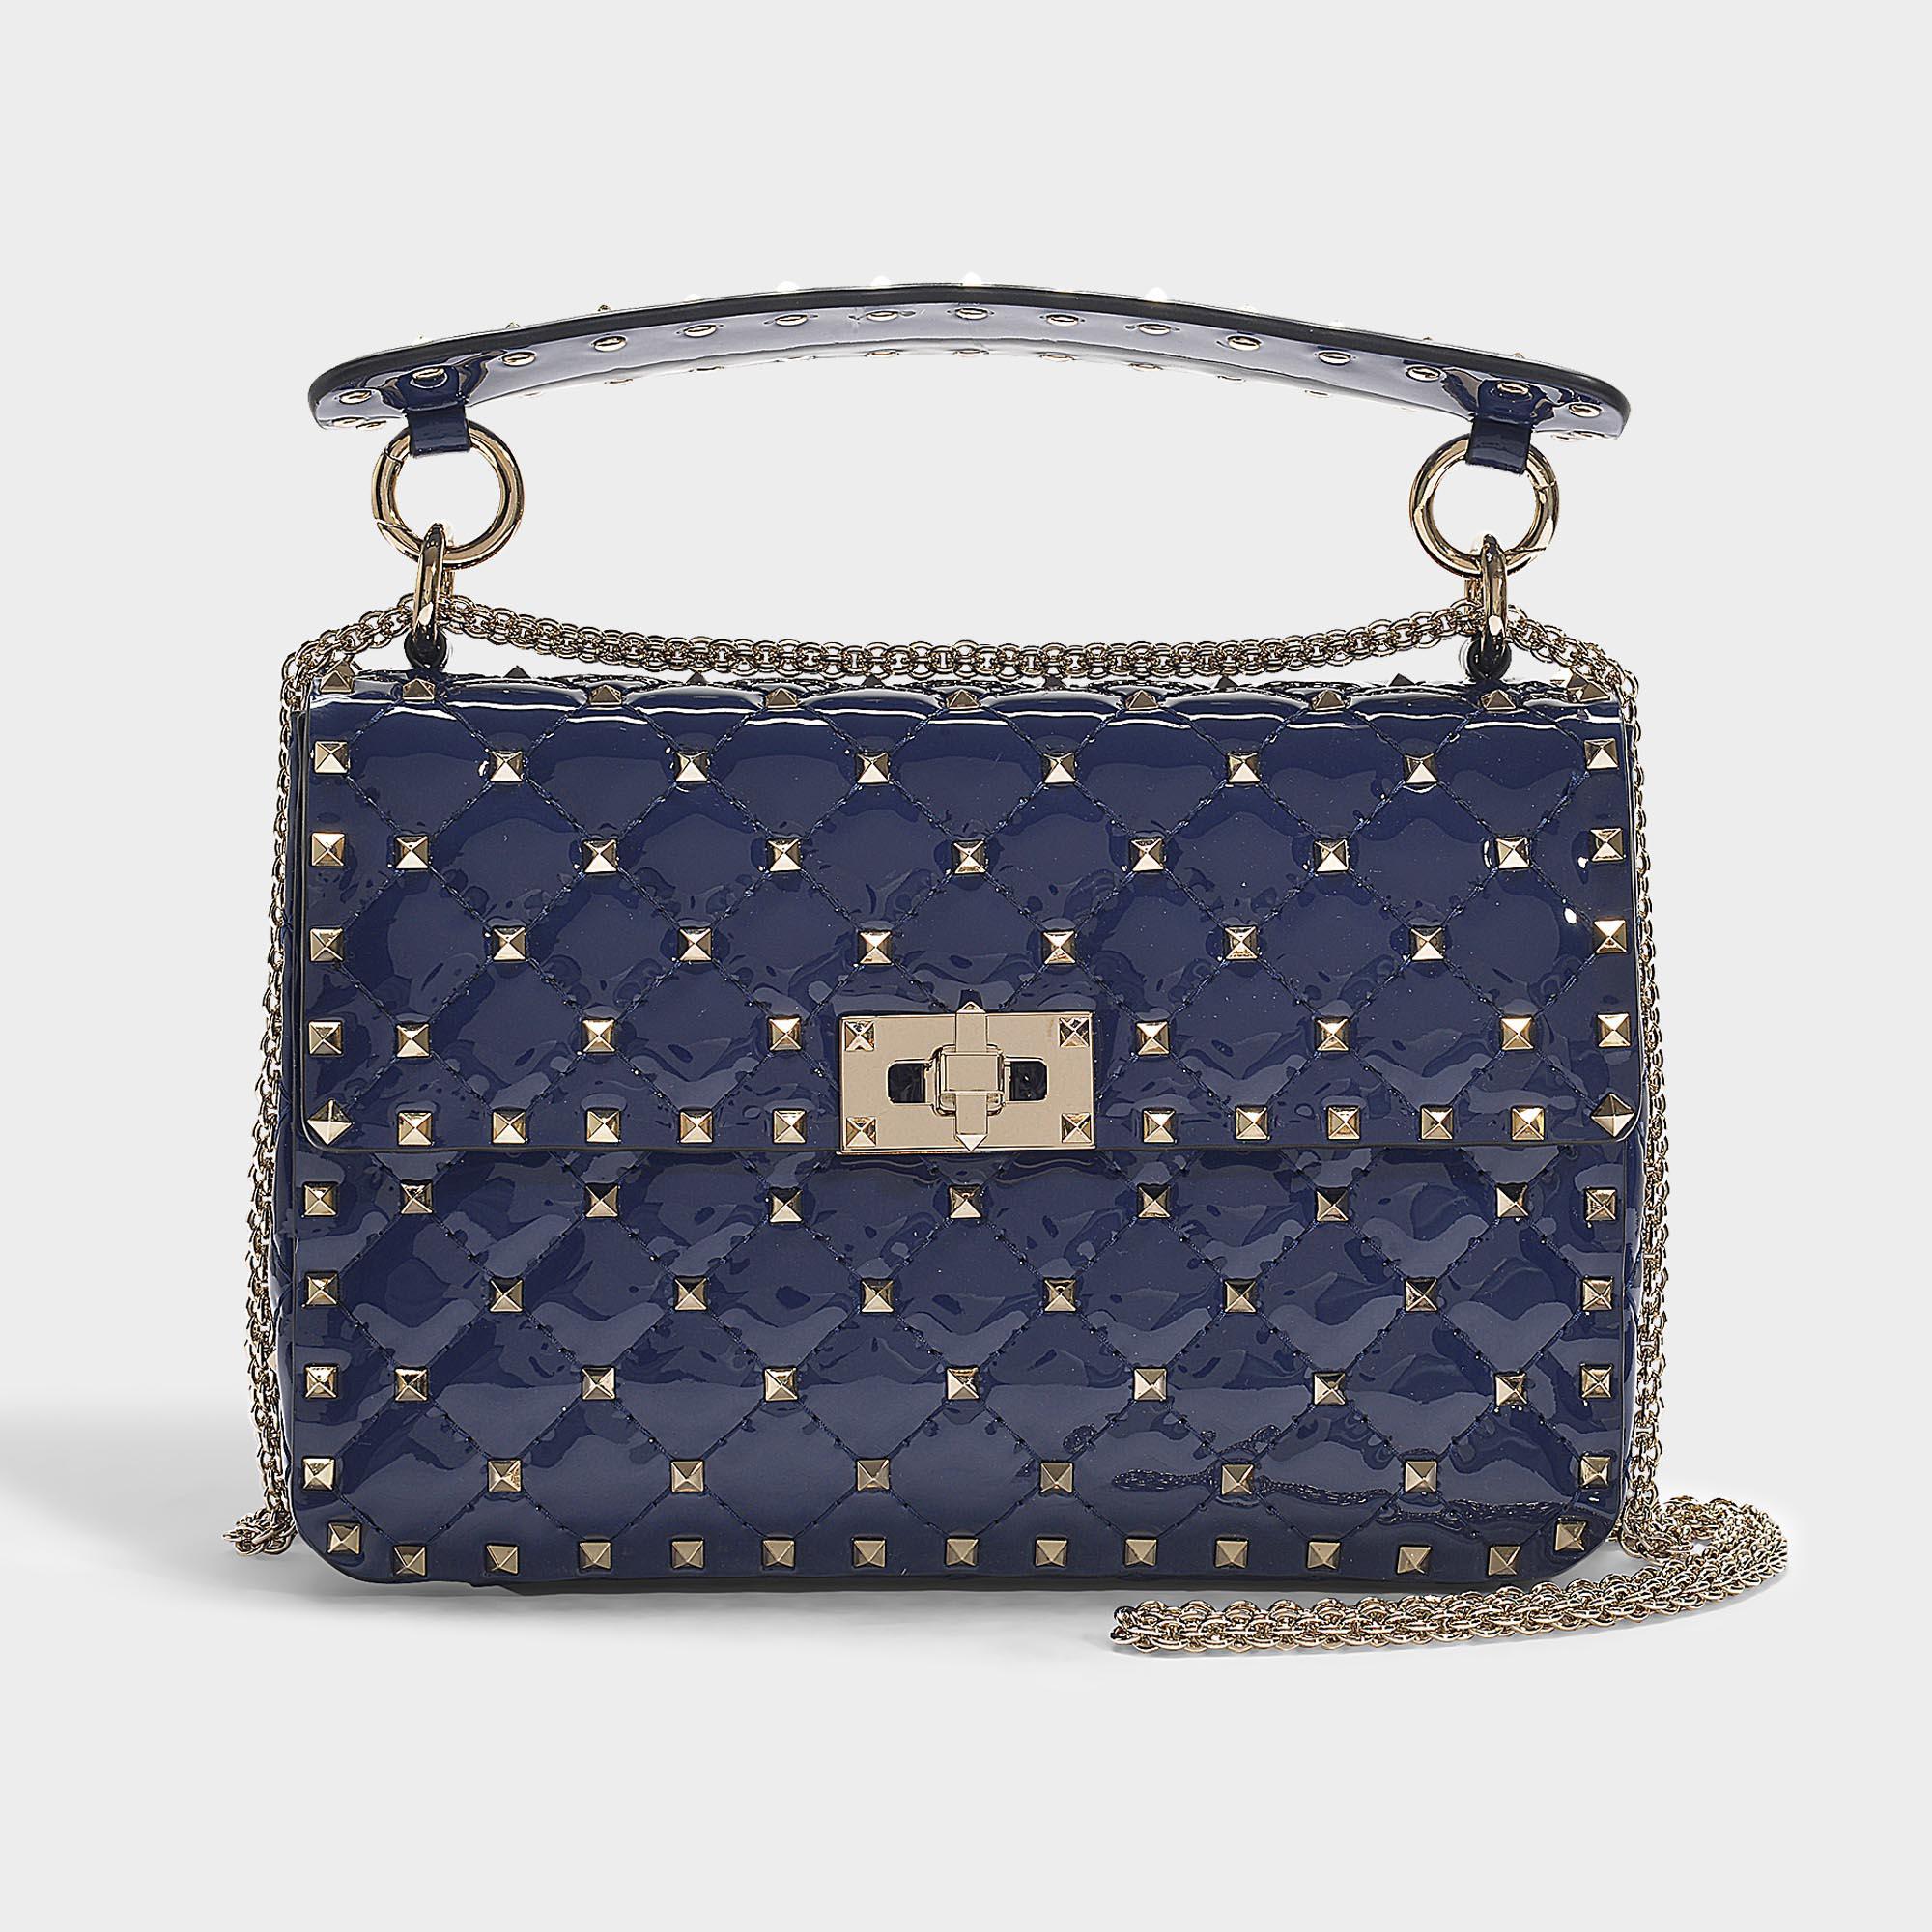 2af948002b6 Valentino - Blue Rockstud Spike Medium Shoulder Bag In Navy Patent Calfskin  - Lyst. View fullscreen